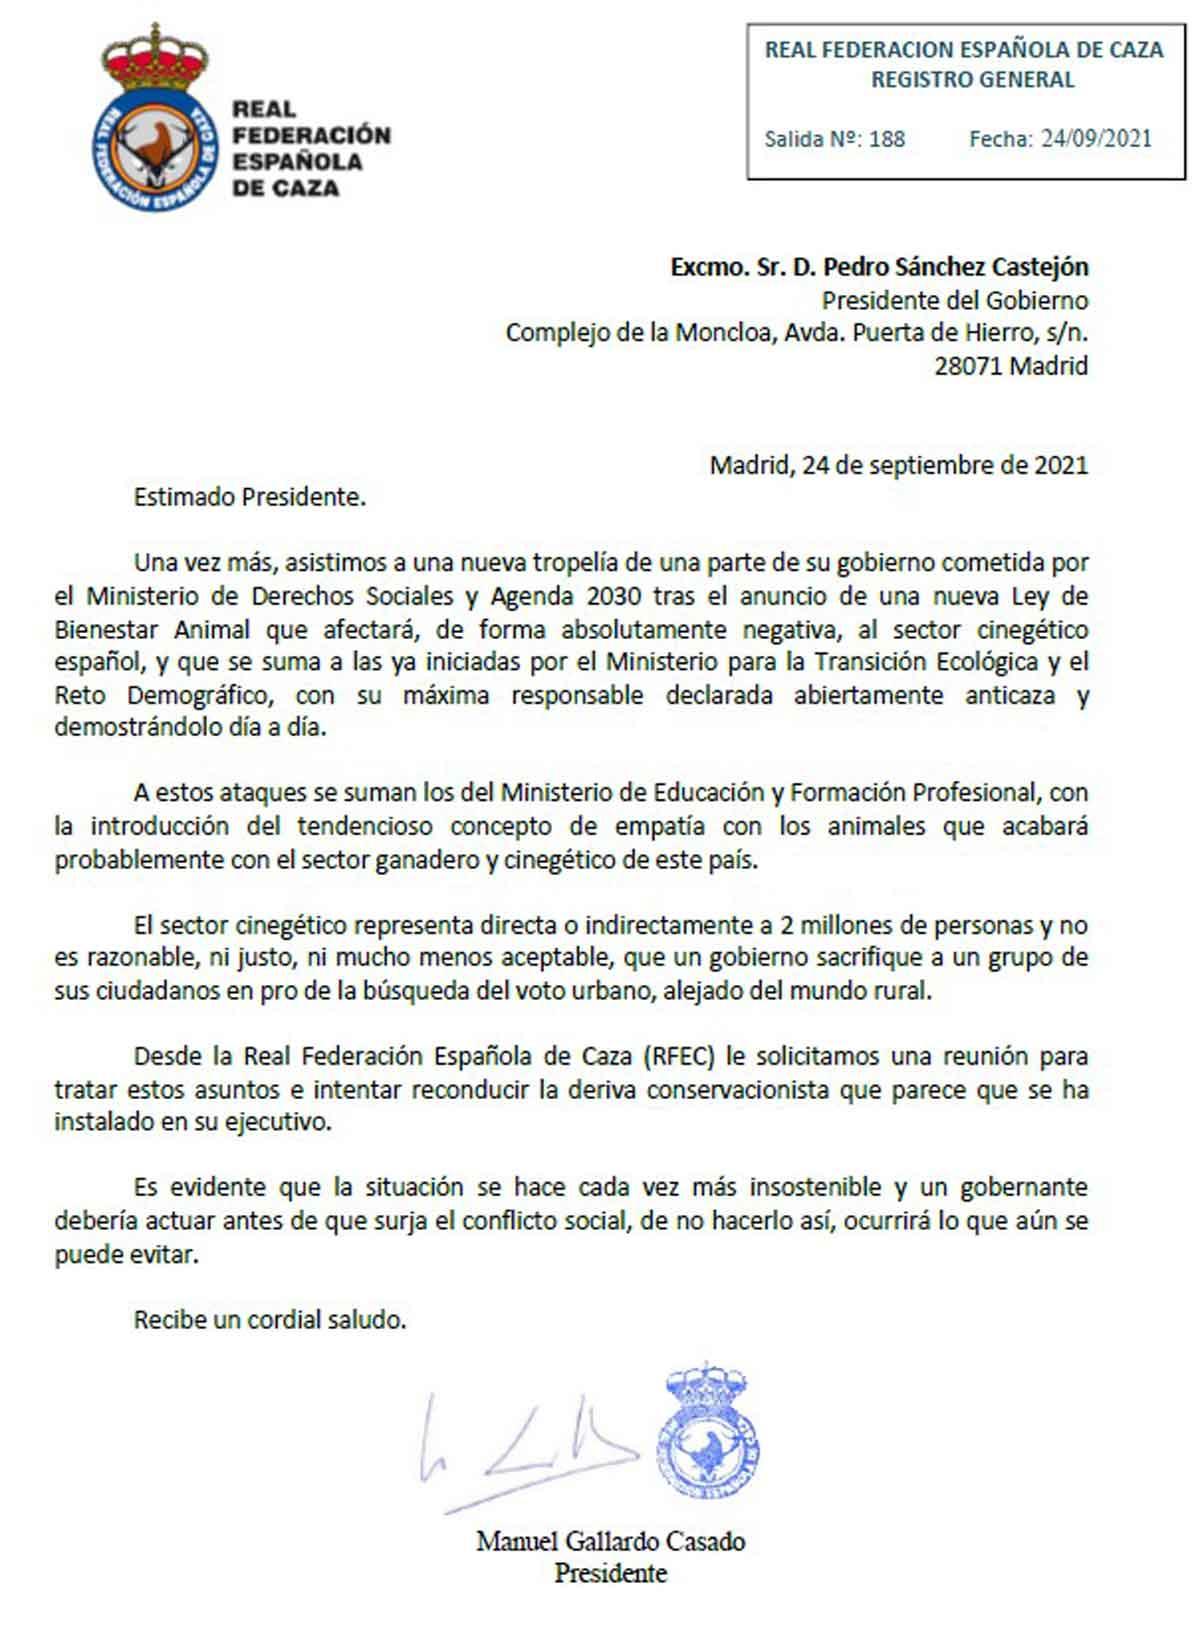 carta RFEC a Pedro Sánchez